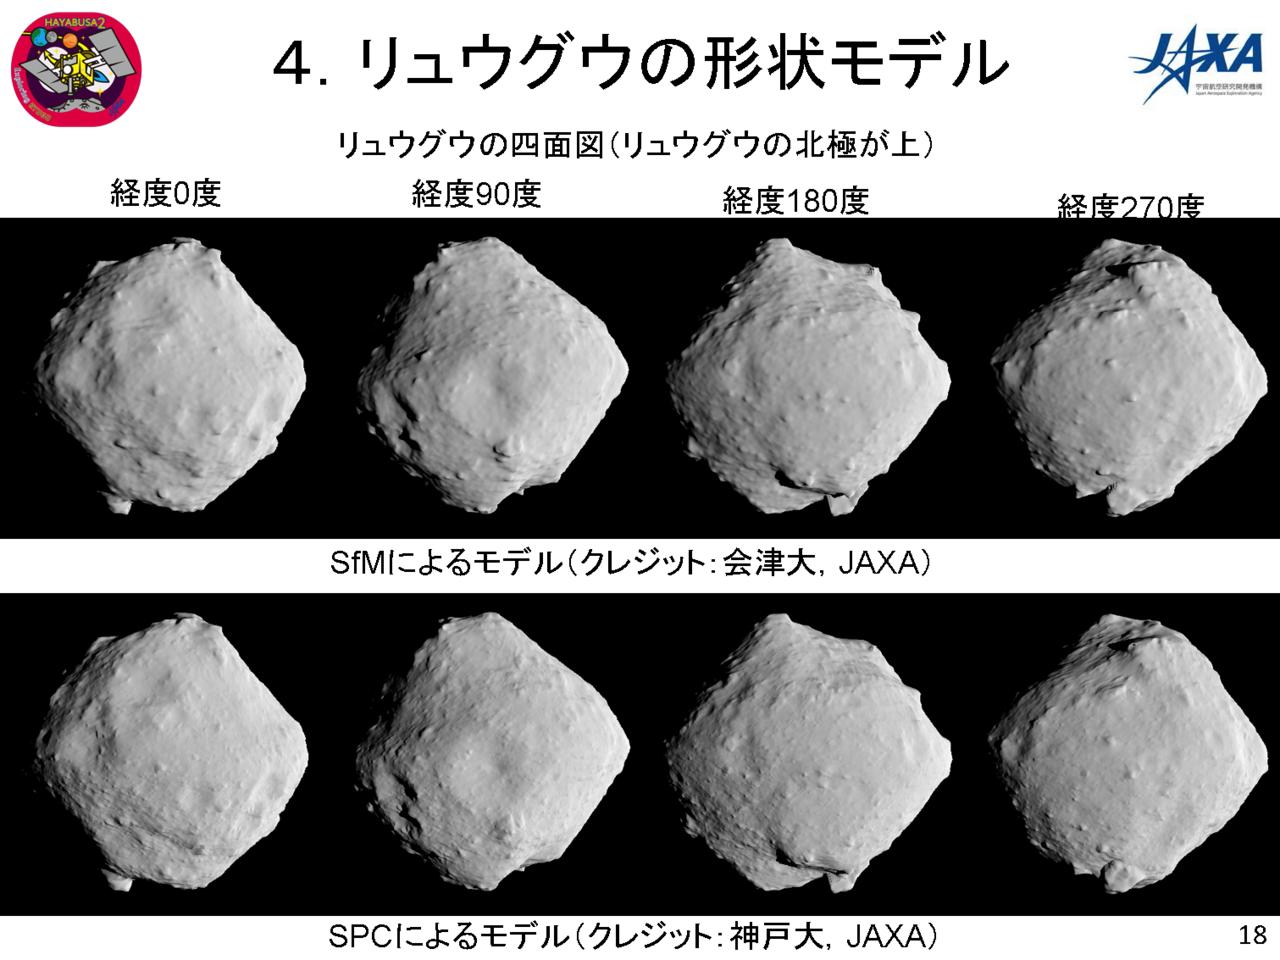 f:id:Imamura:20180802145938p:plain